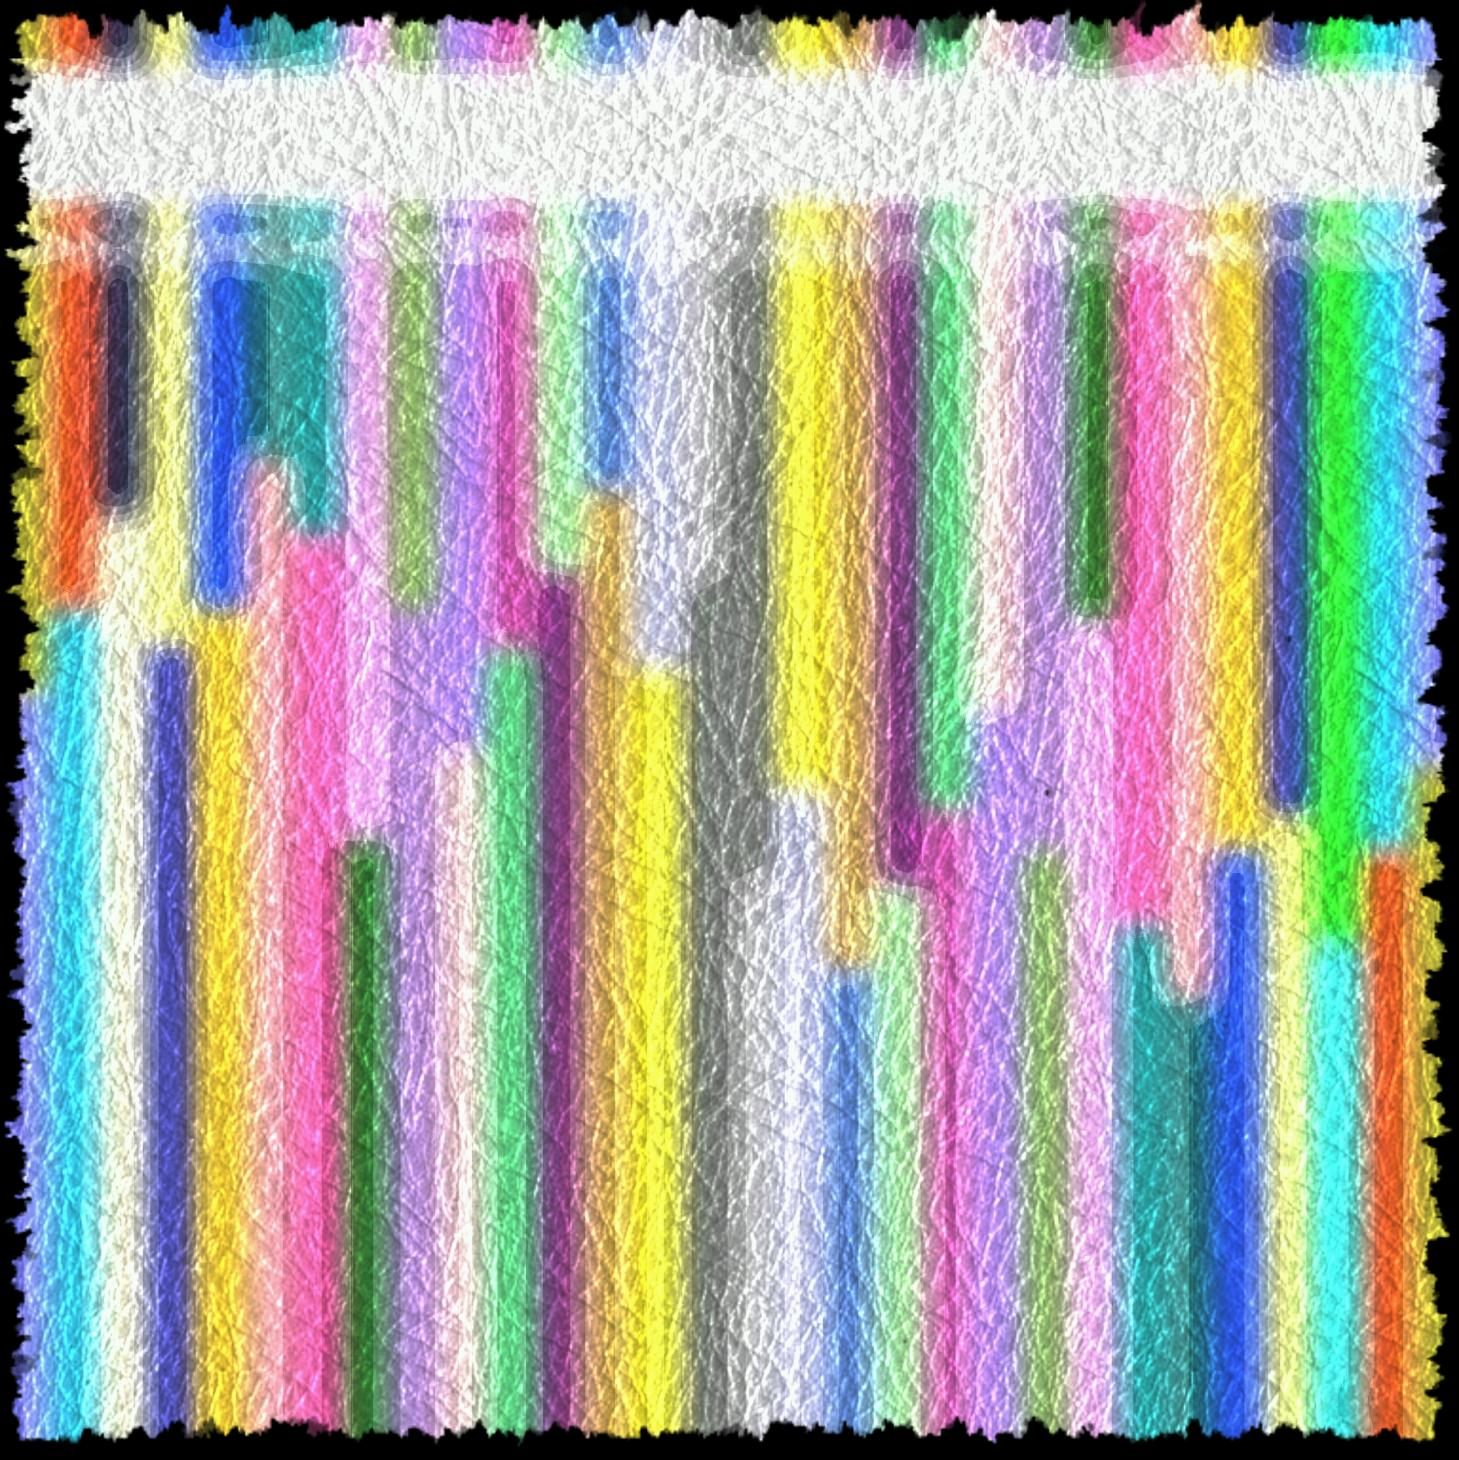 Cristalera de colores. Abstracción (2014) - Fernando Salmon Iza